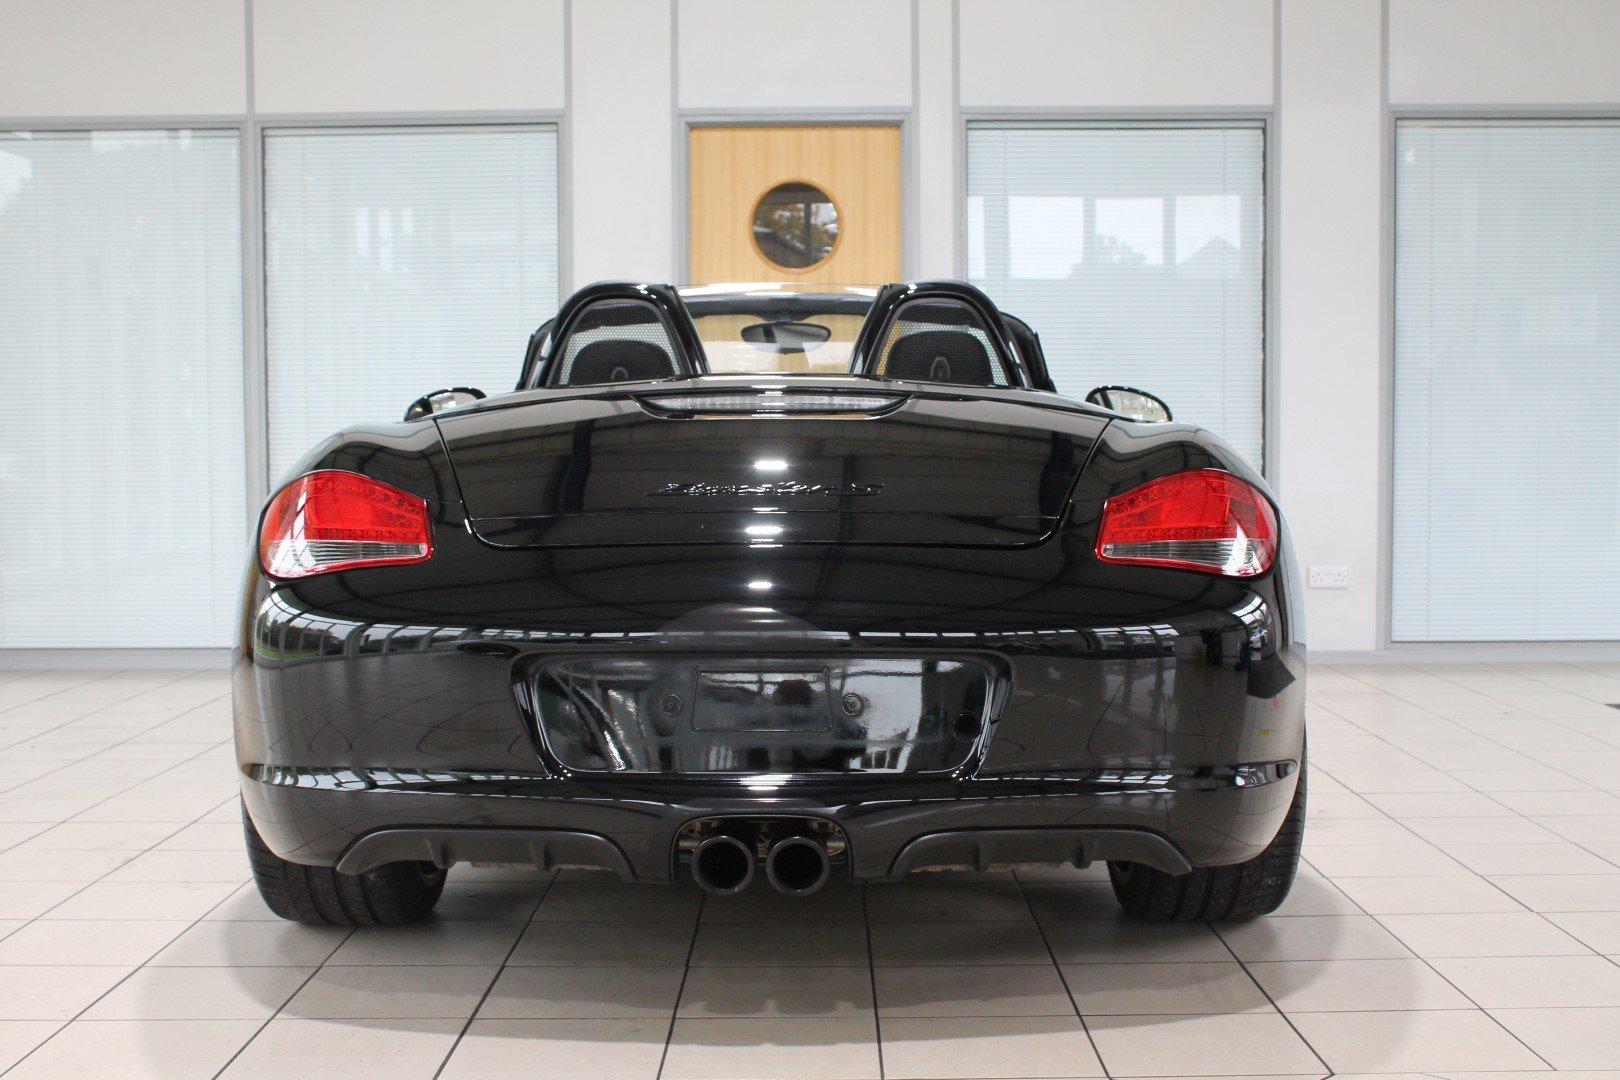 2011 Porsche Boxster (987) 3.4 S Black Edition Manual For Sale (picture 8 of 12)